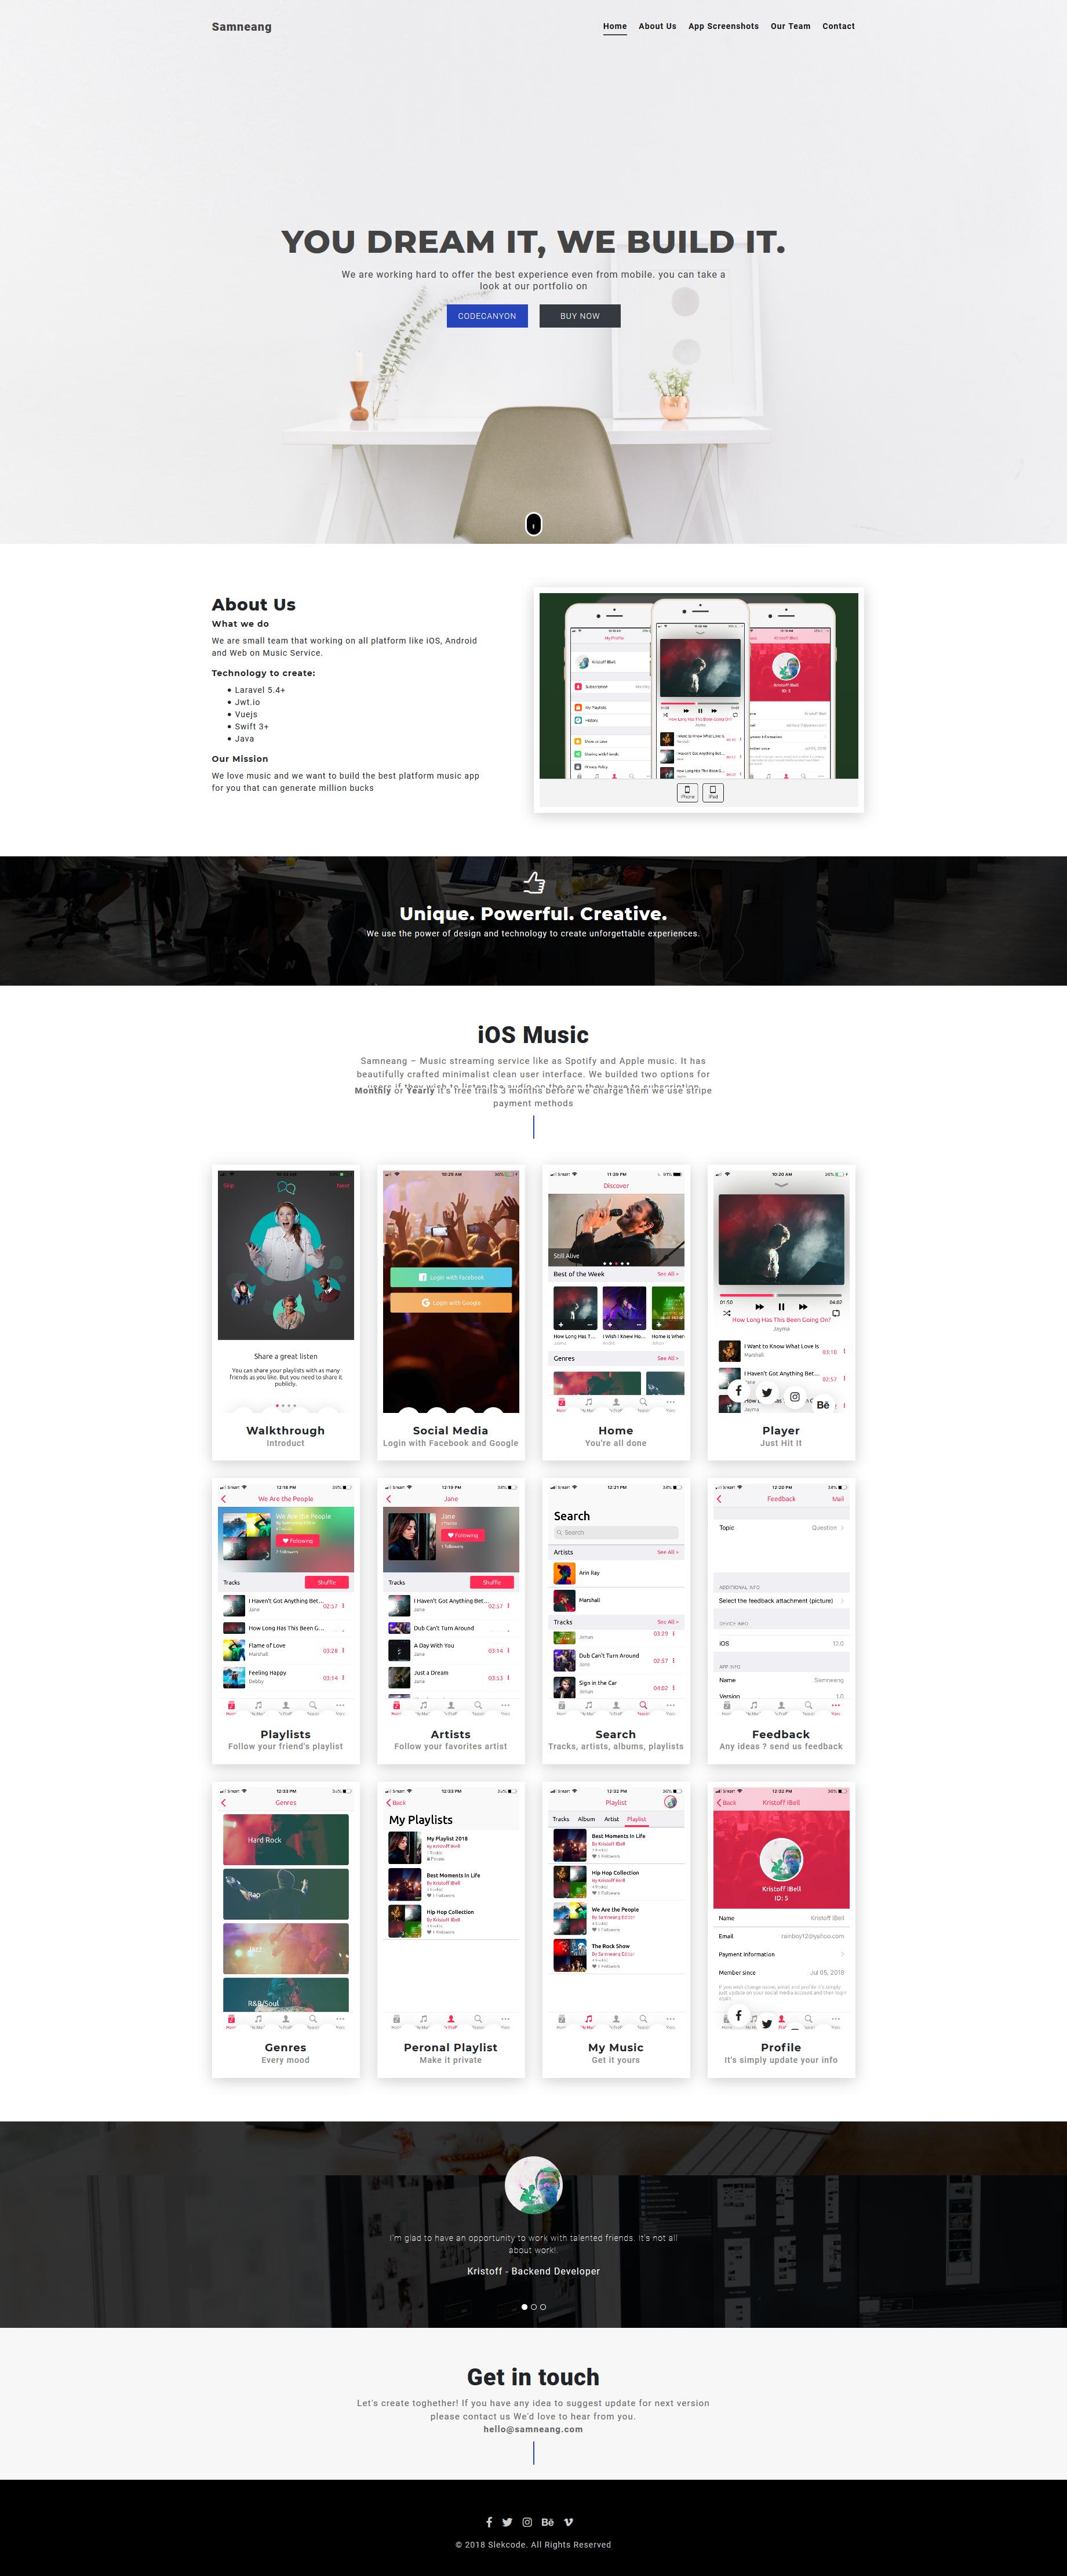 Image demo screen